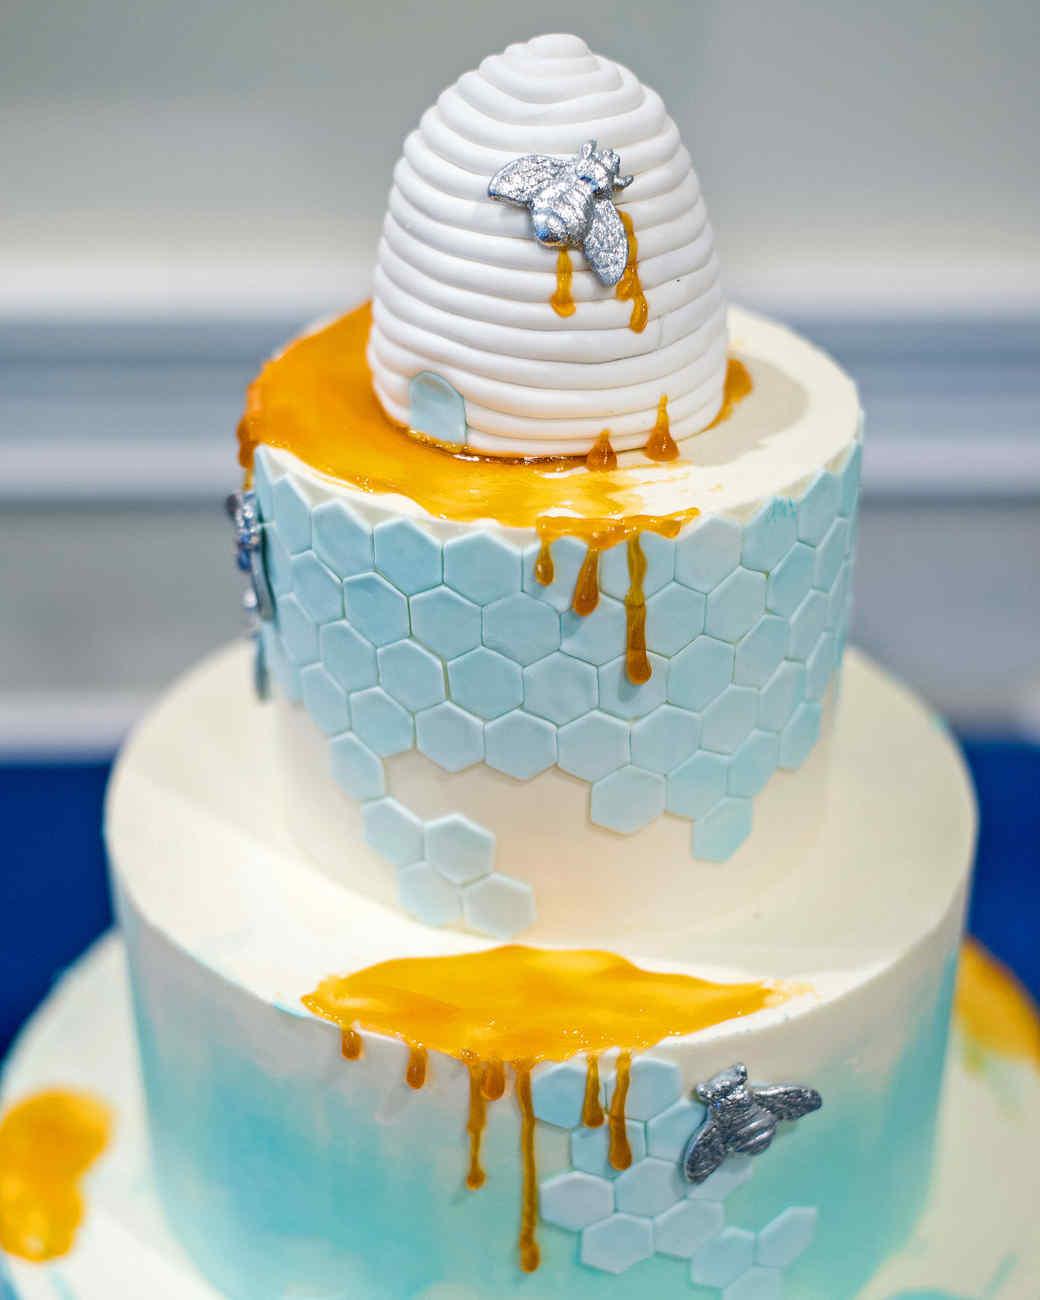 mangiolino cake tight closeup